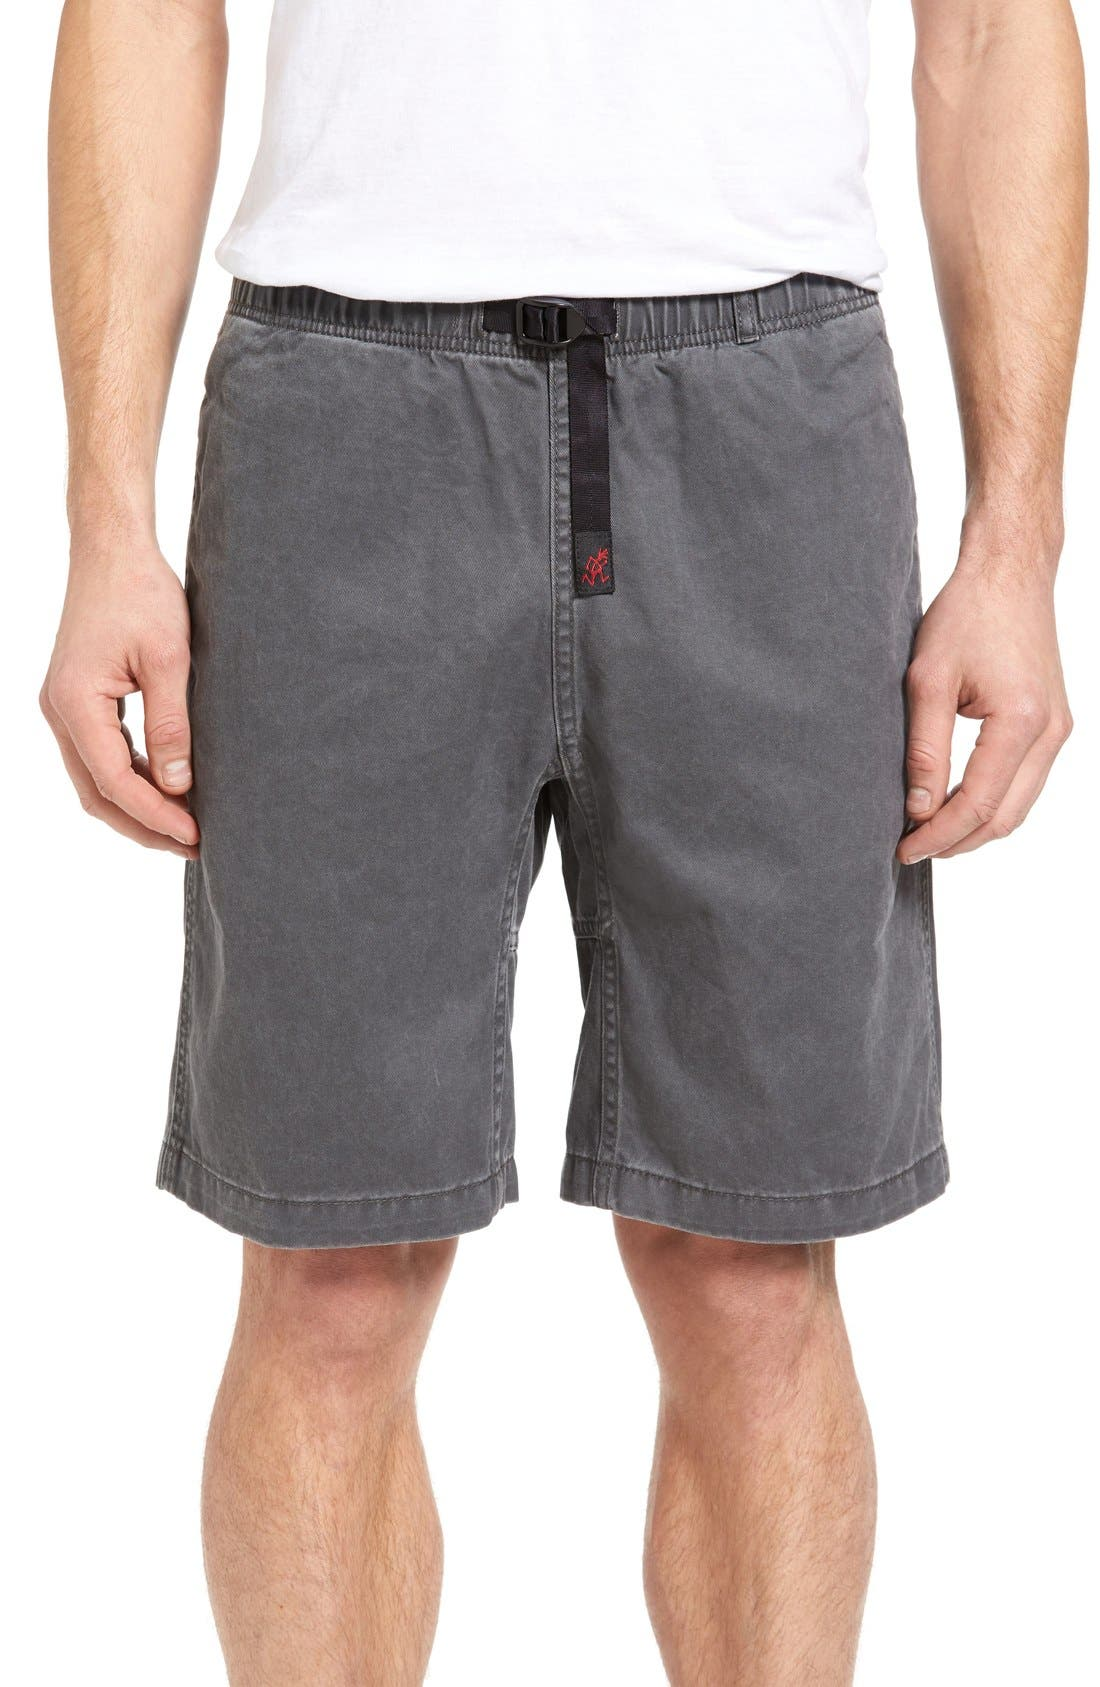 Rockin Sport Shorts,                         Main,                         color, Asphalt Grey